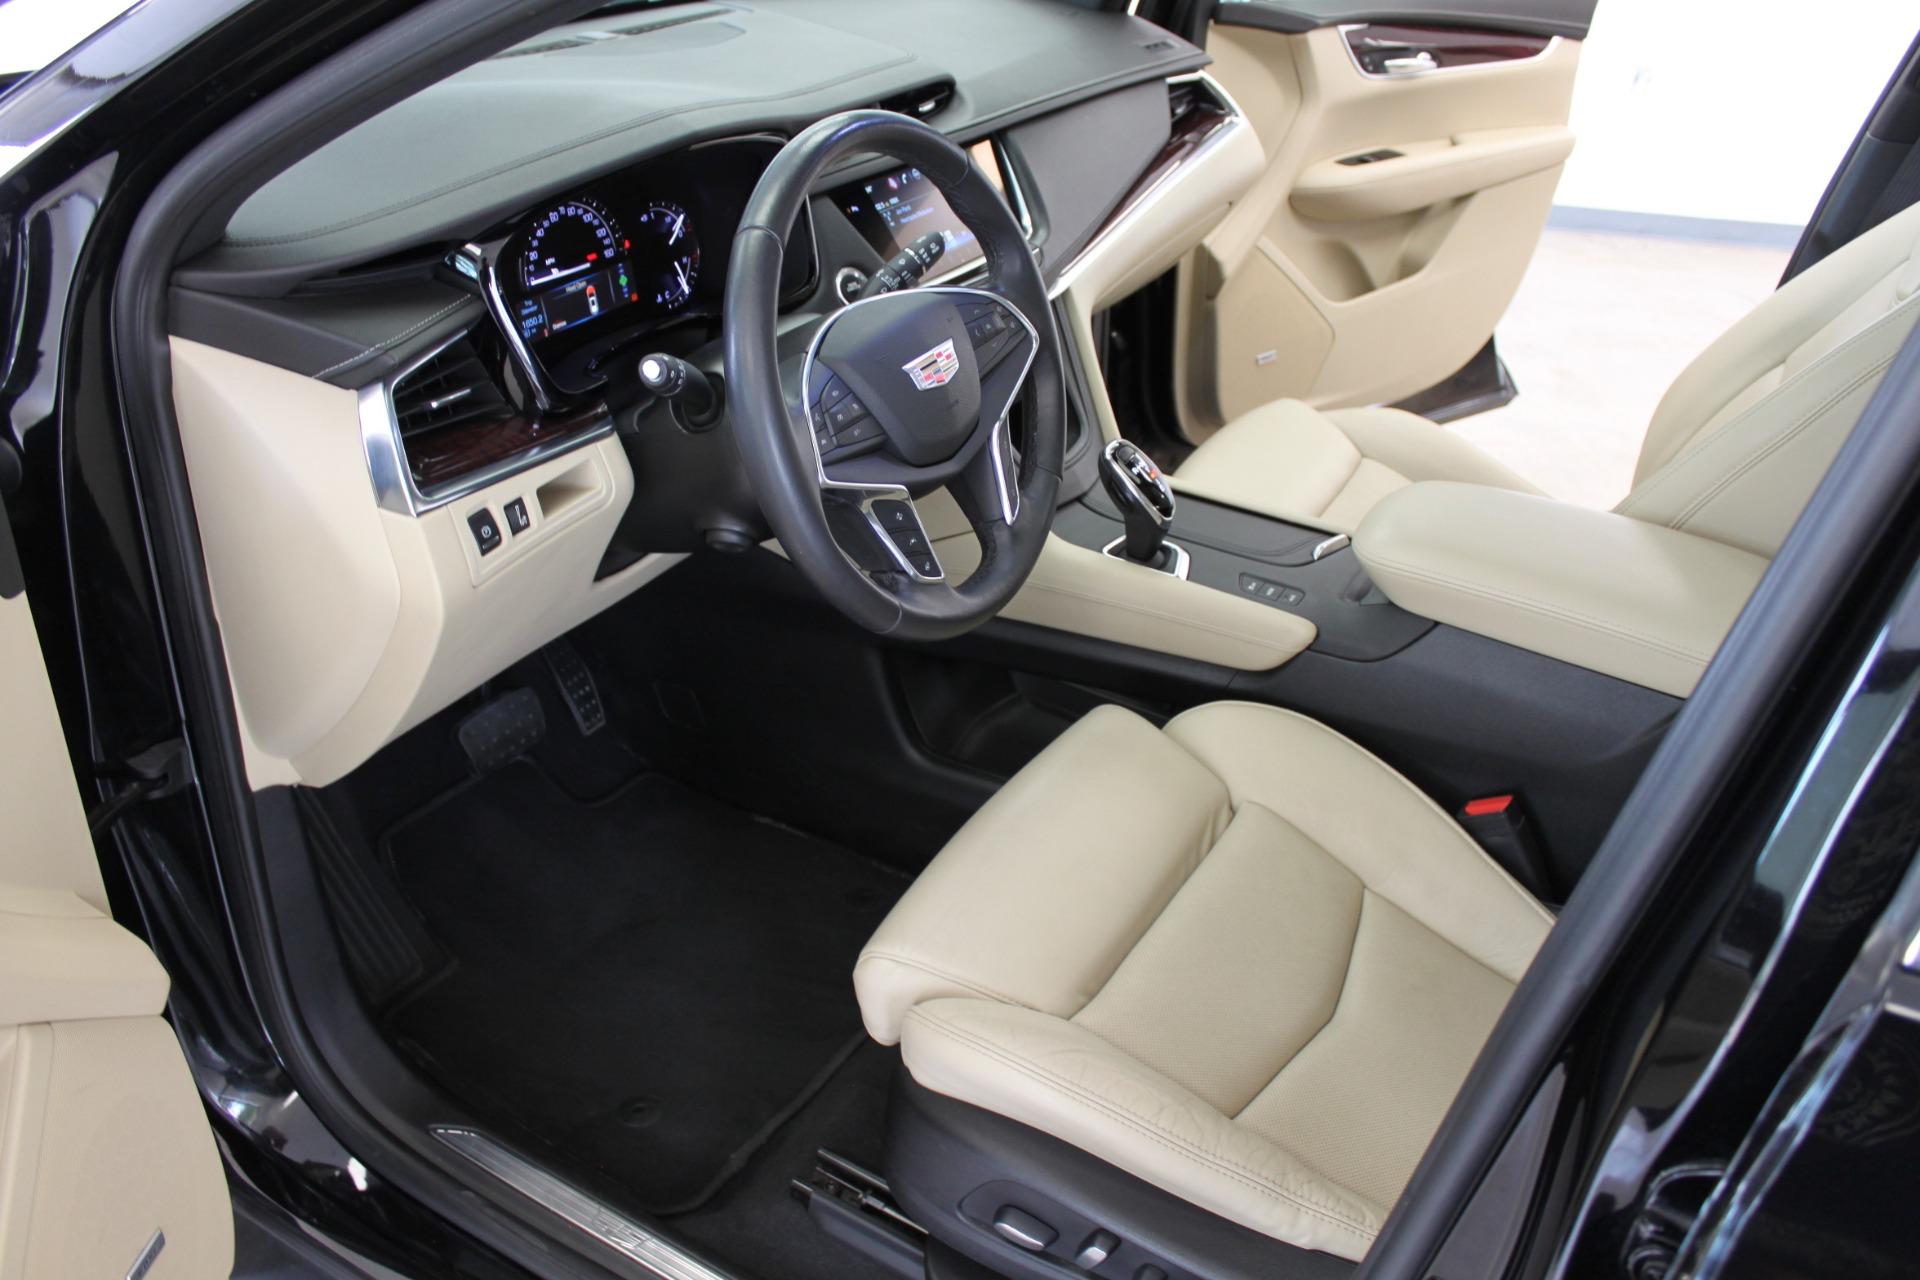 Used-2017-Cadillac-XT5-Luxury-All-Wheel-Drive-Luxury-AWD-Collector